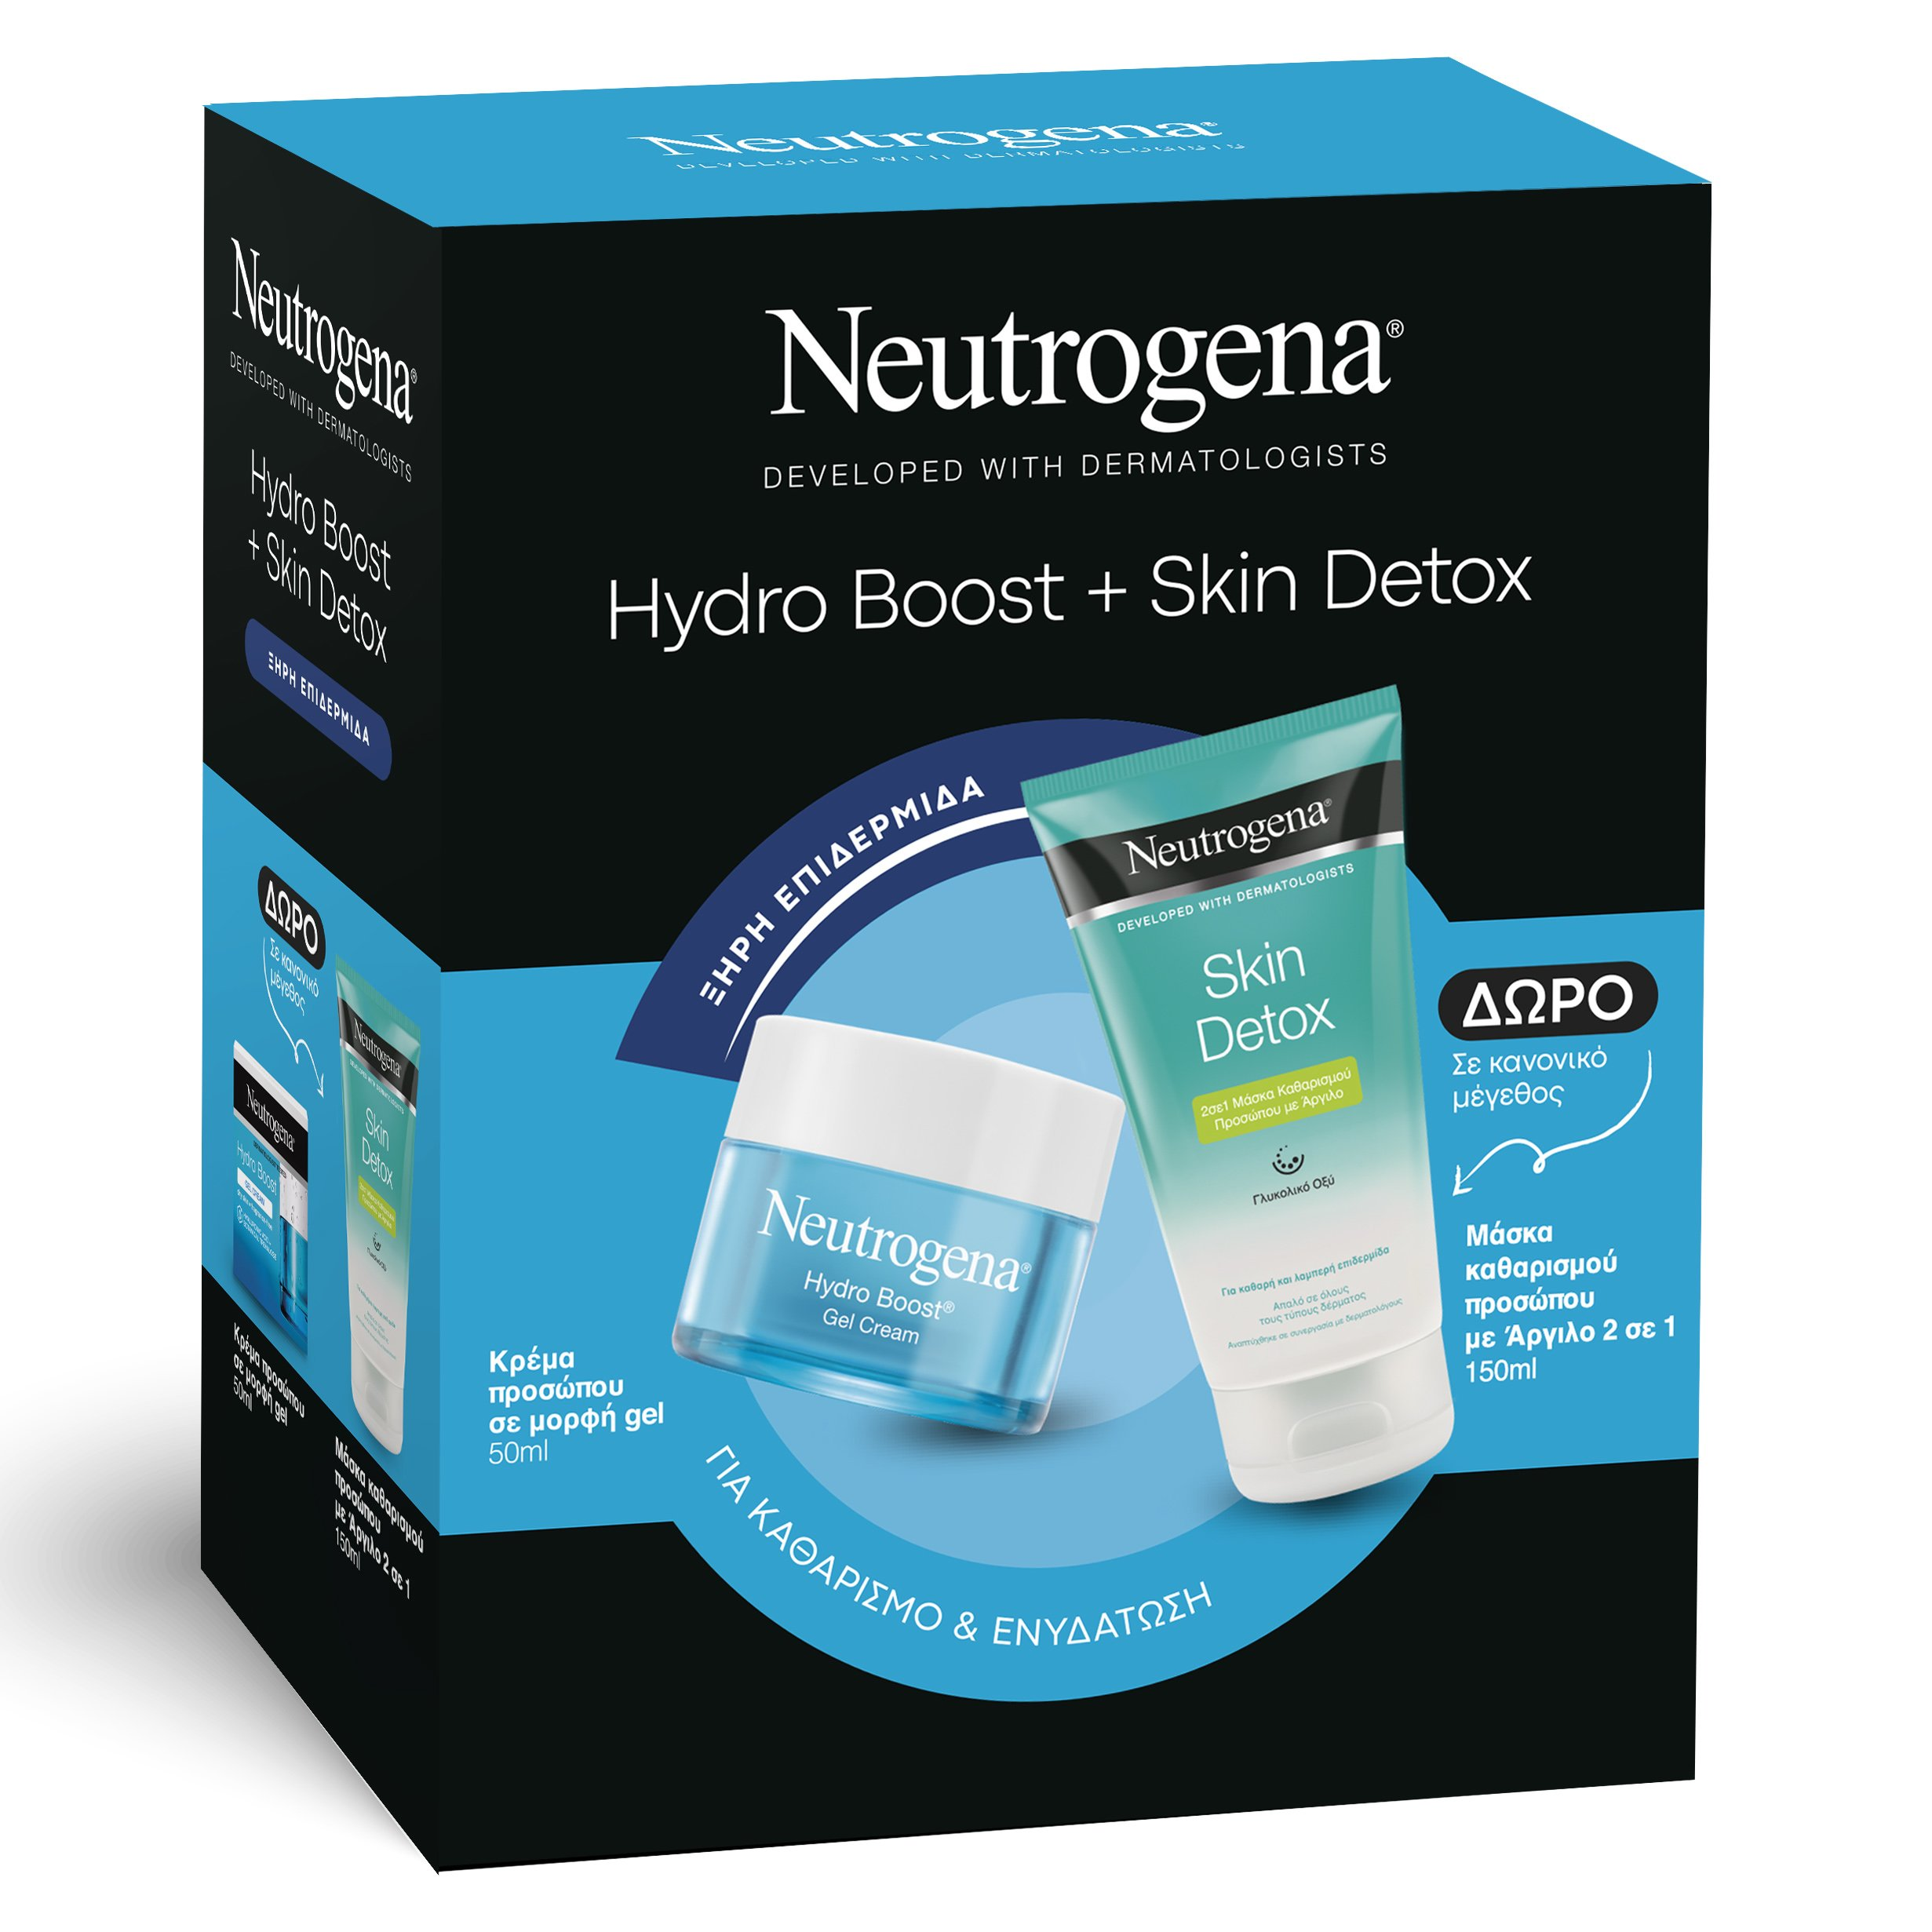 Neutrogena Πακέτο Προσφοράς Hydro Boost Gel Cream Κρέμα για Ξηρές Επιδερμίδες 50ml & Δώρο Skin Detox Mask Μάσκα Προσώπου 150ml